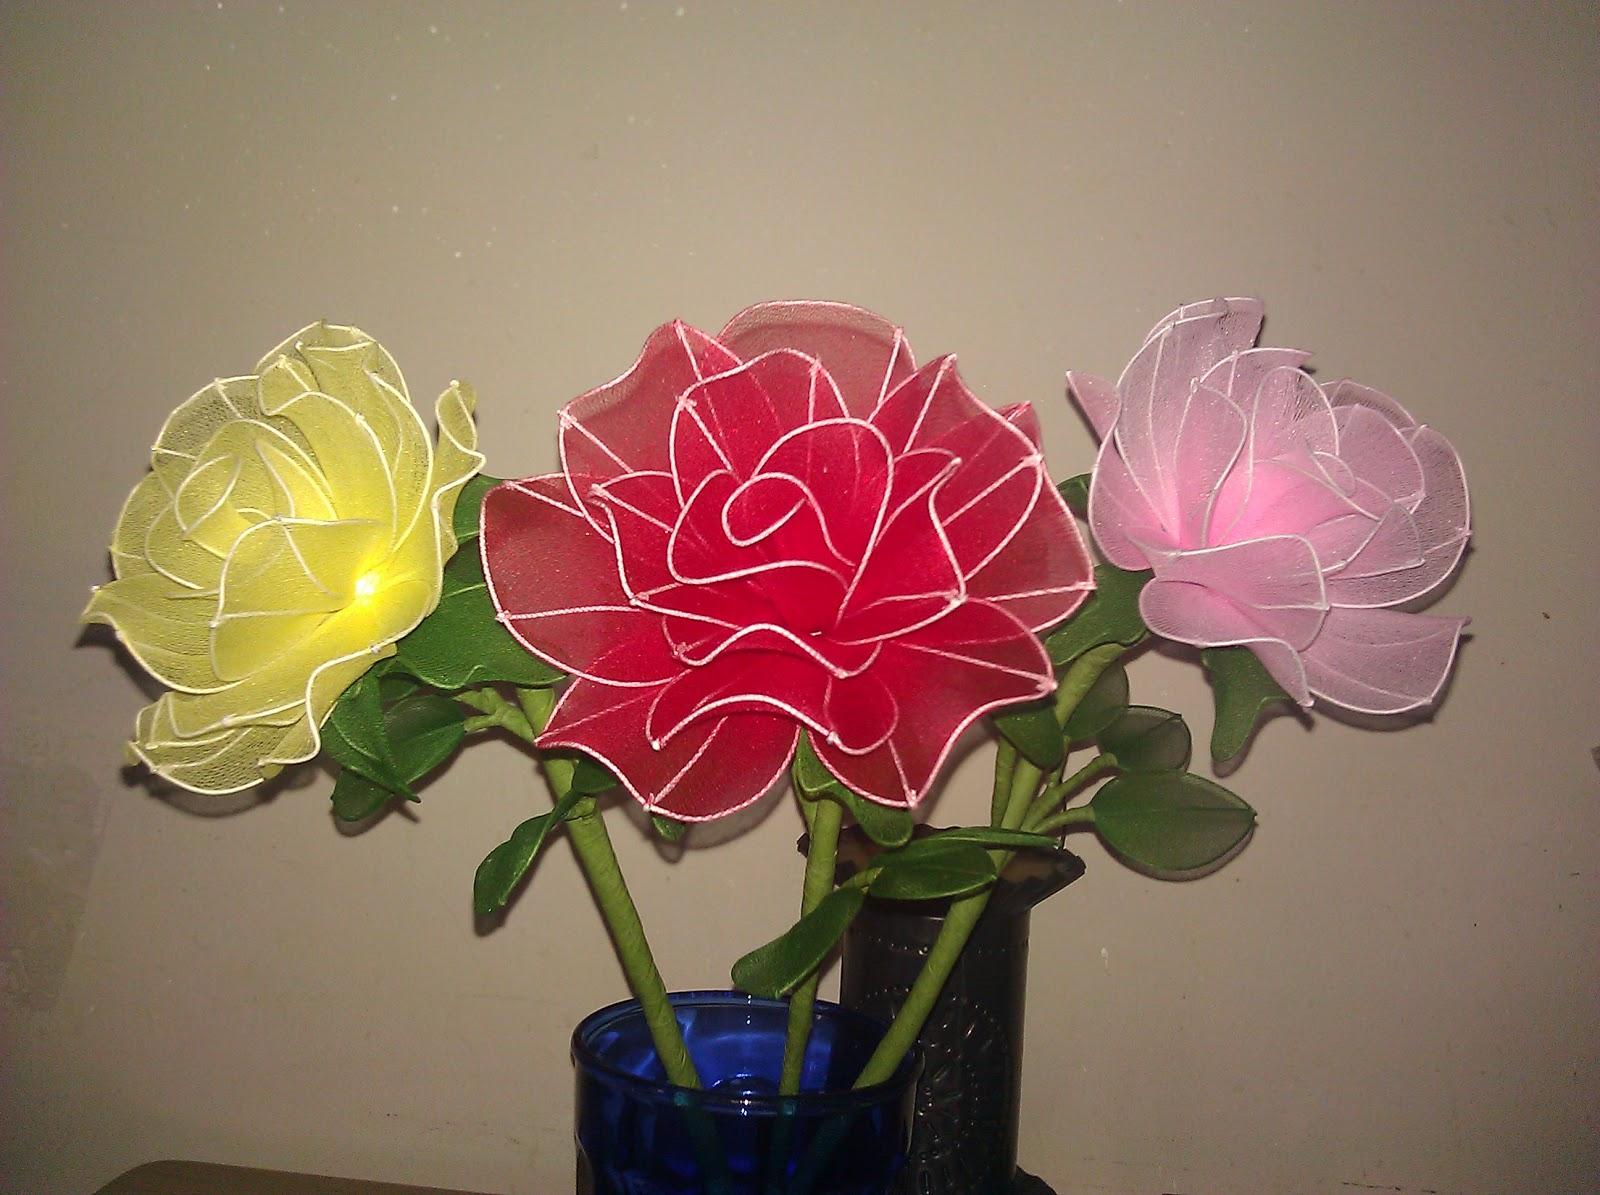 Nylon flowers flores de nylon echas por leon jeronez - Flores de telas hechas a mano ...